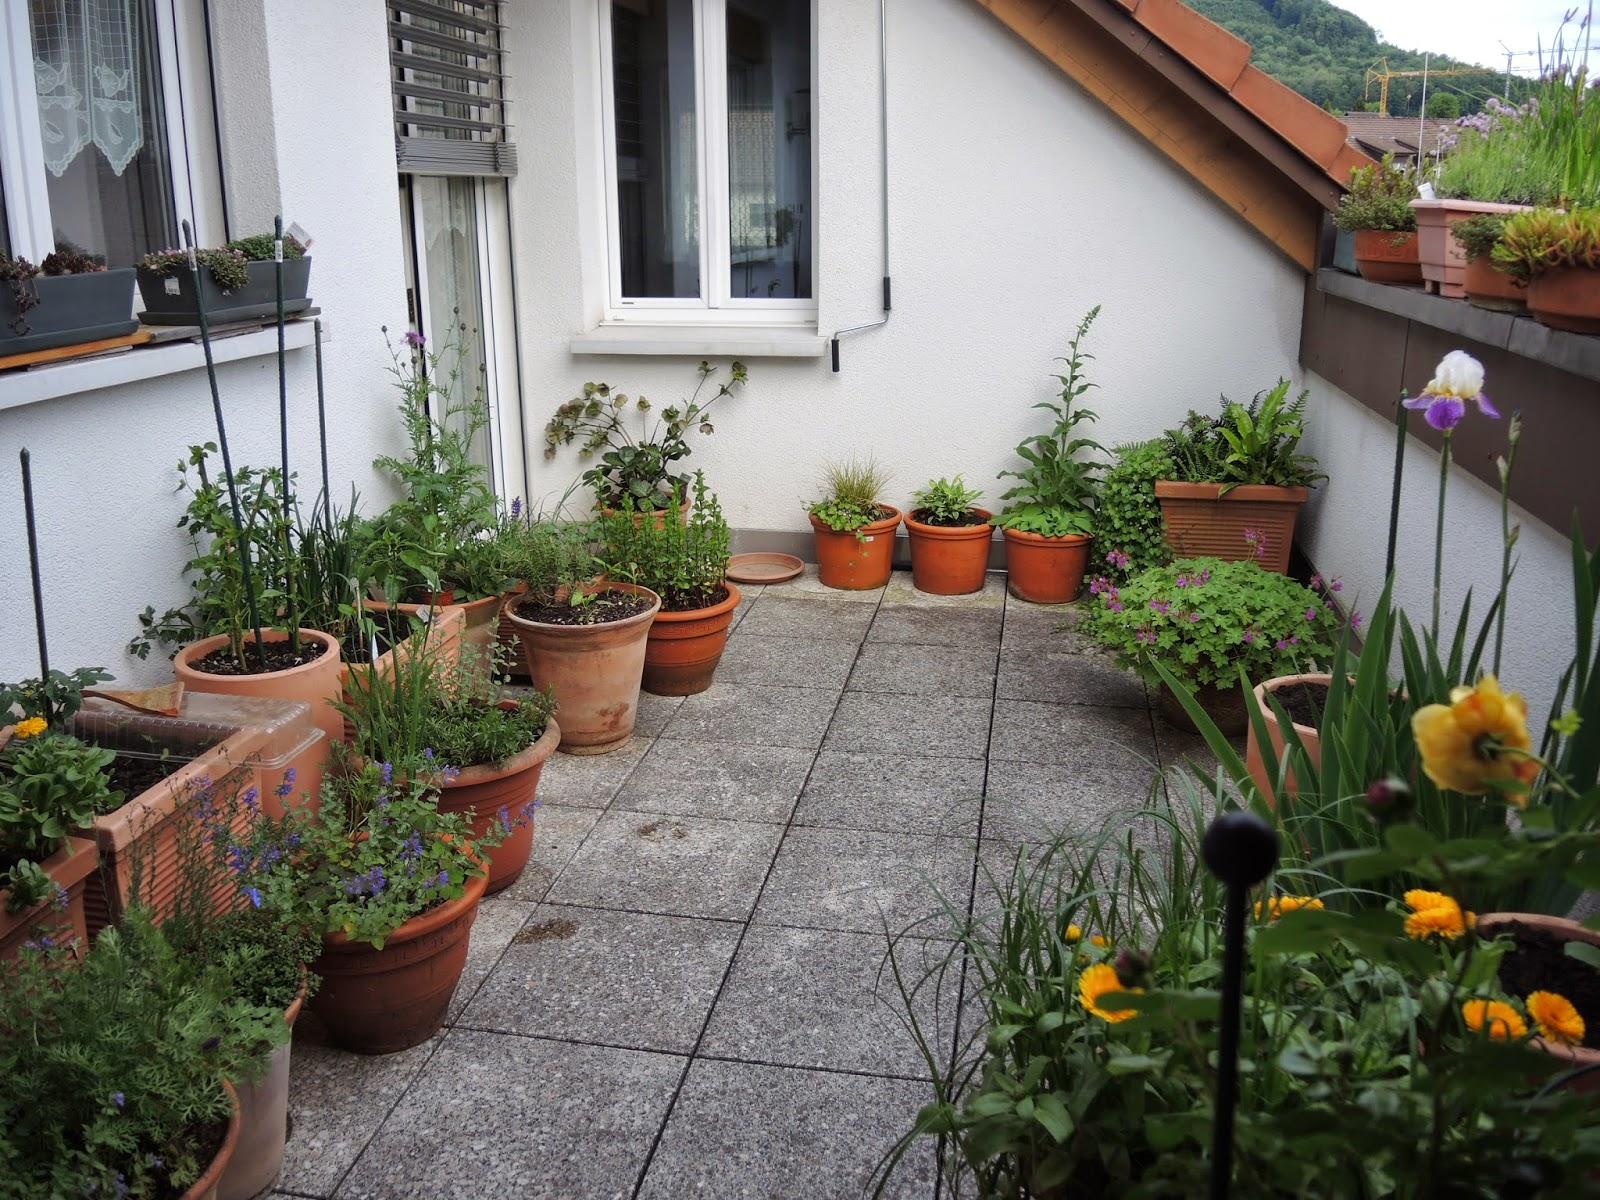 netzwerk balkongarten fragen zu meinem balkon aus dem fricktal. Black Bedroom Furniture Sets. Home Design Ideas